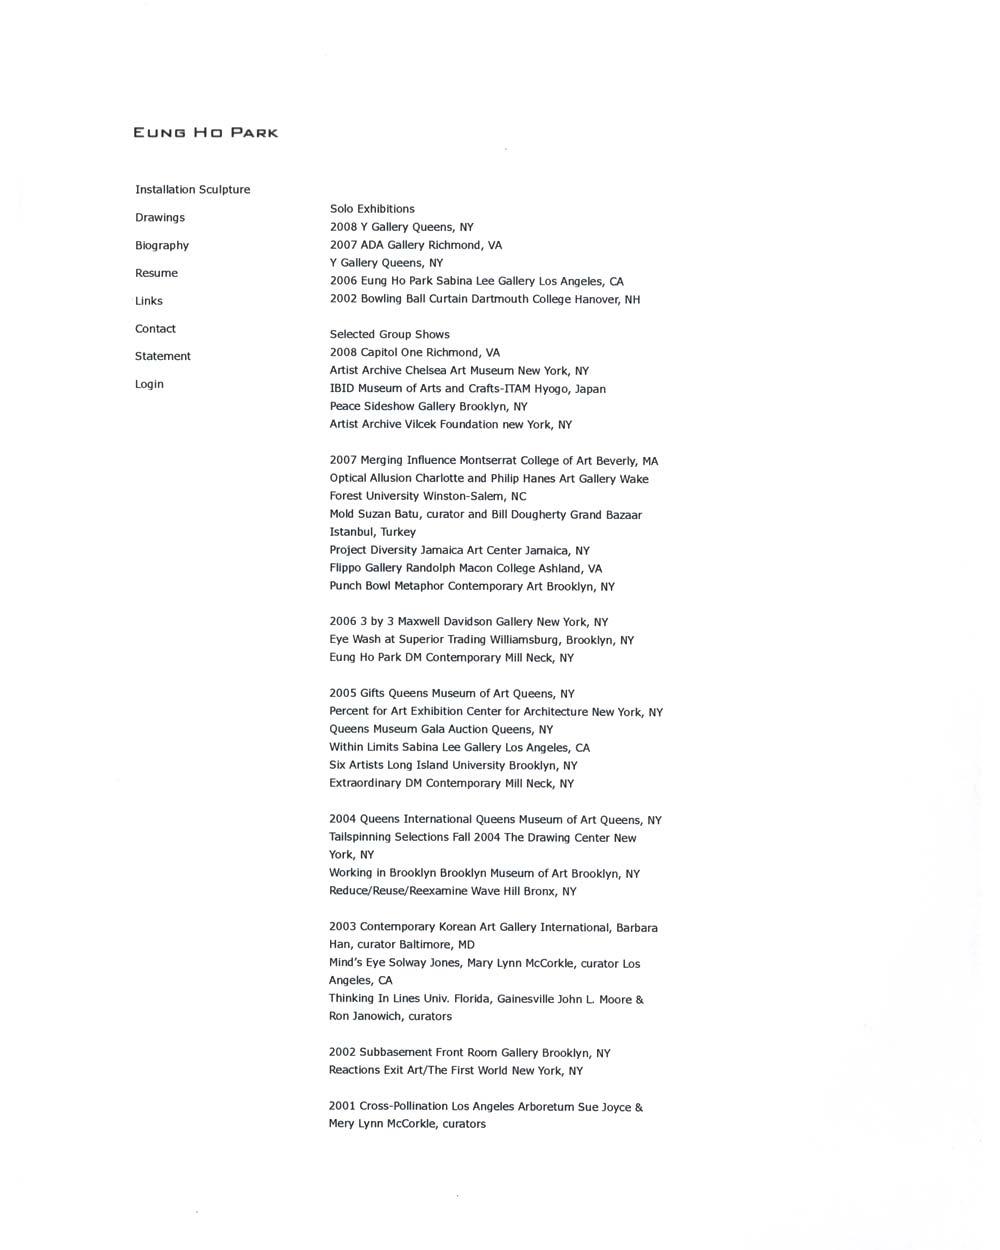 Eung Ho Park's Resume, pg 1